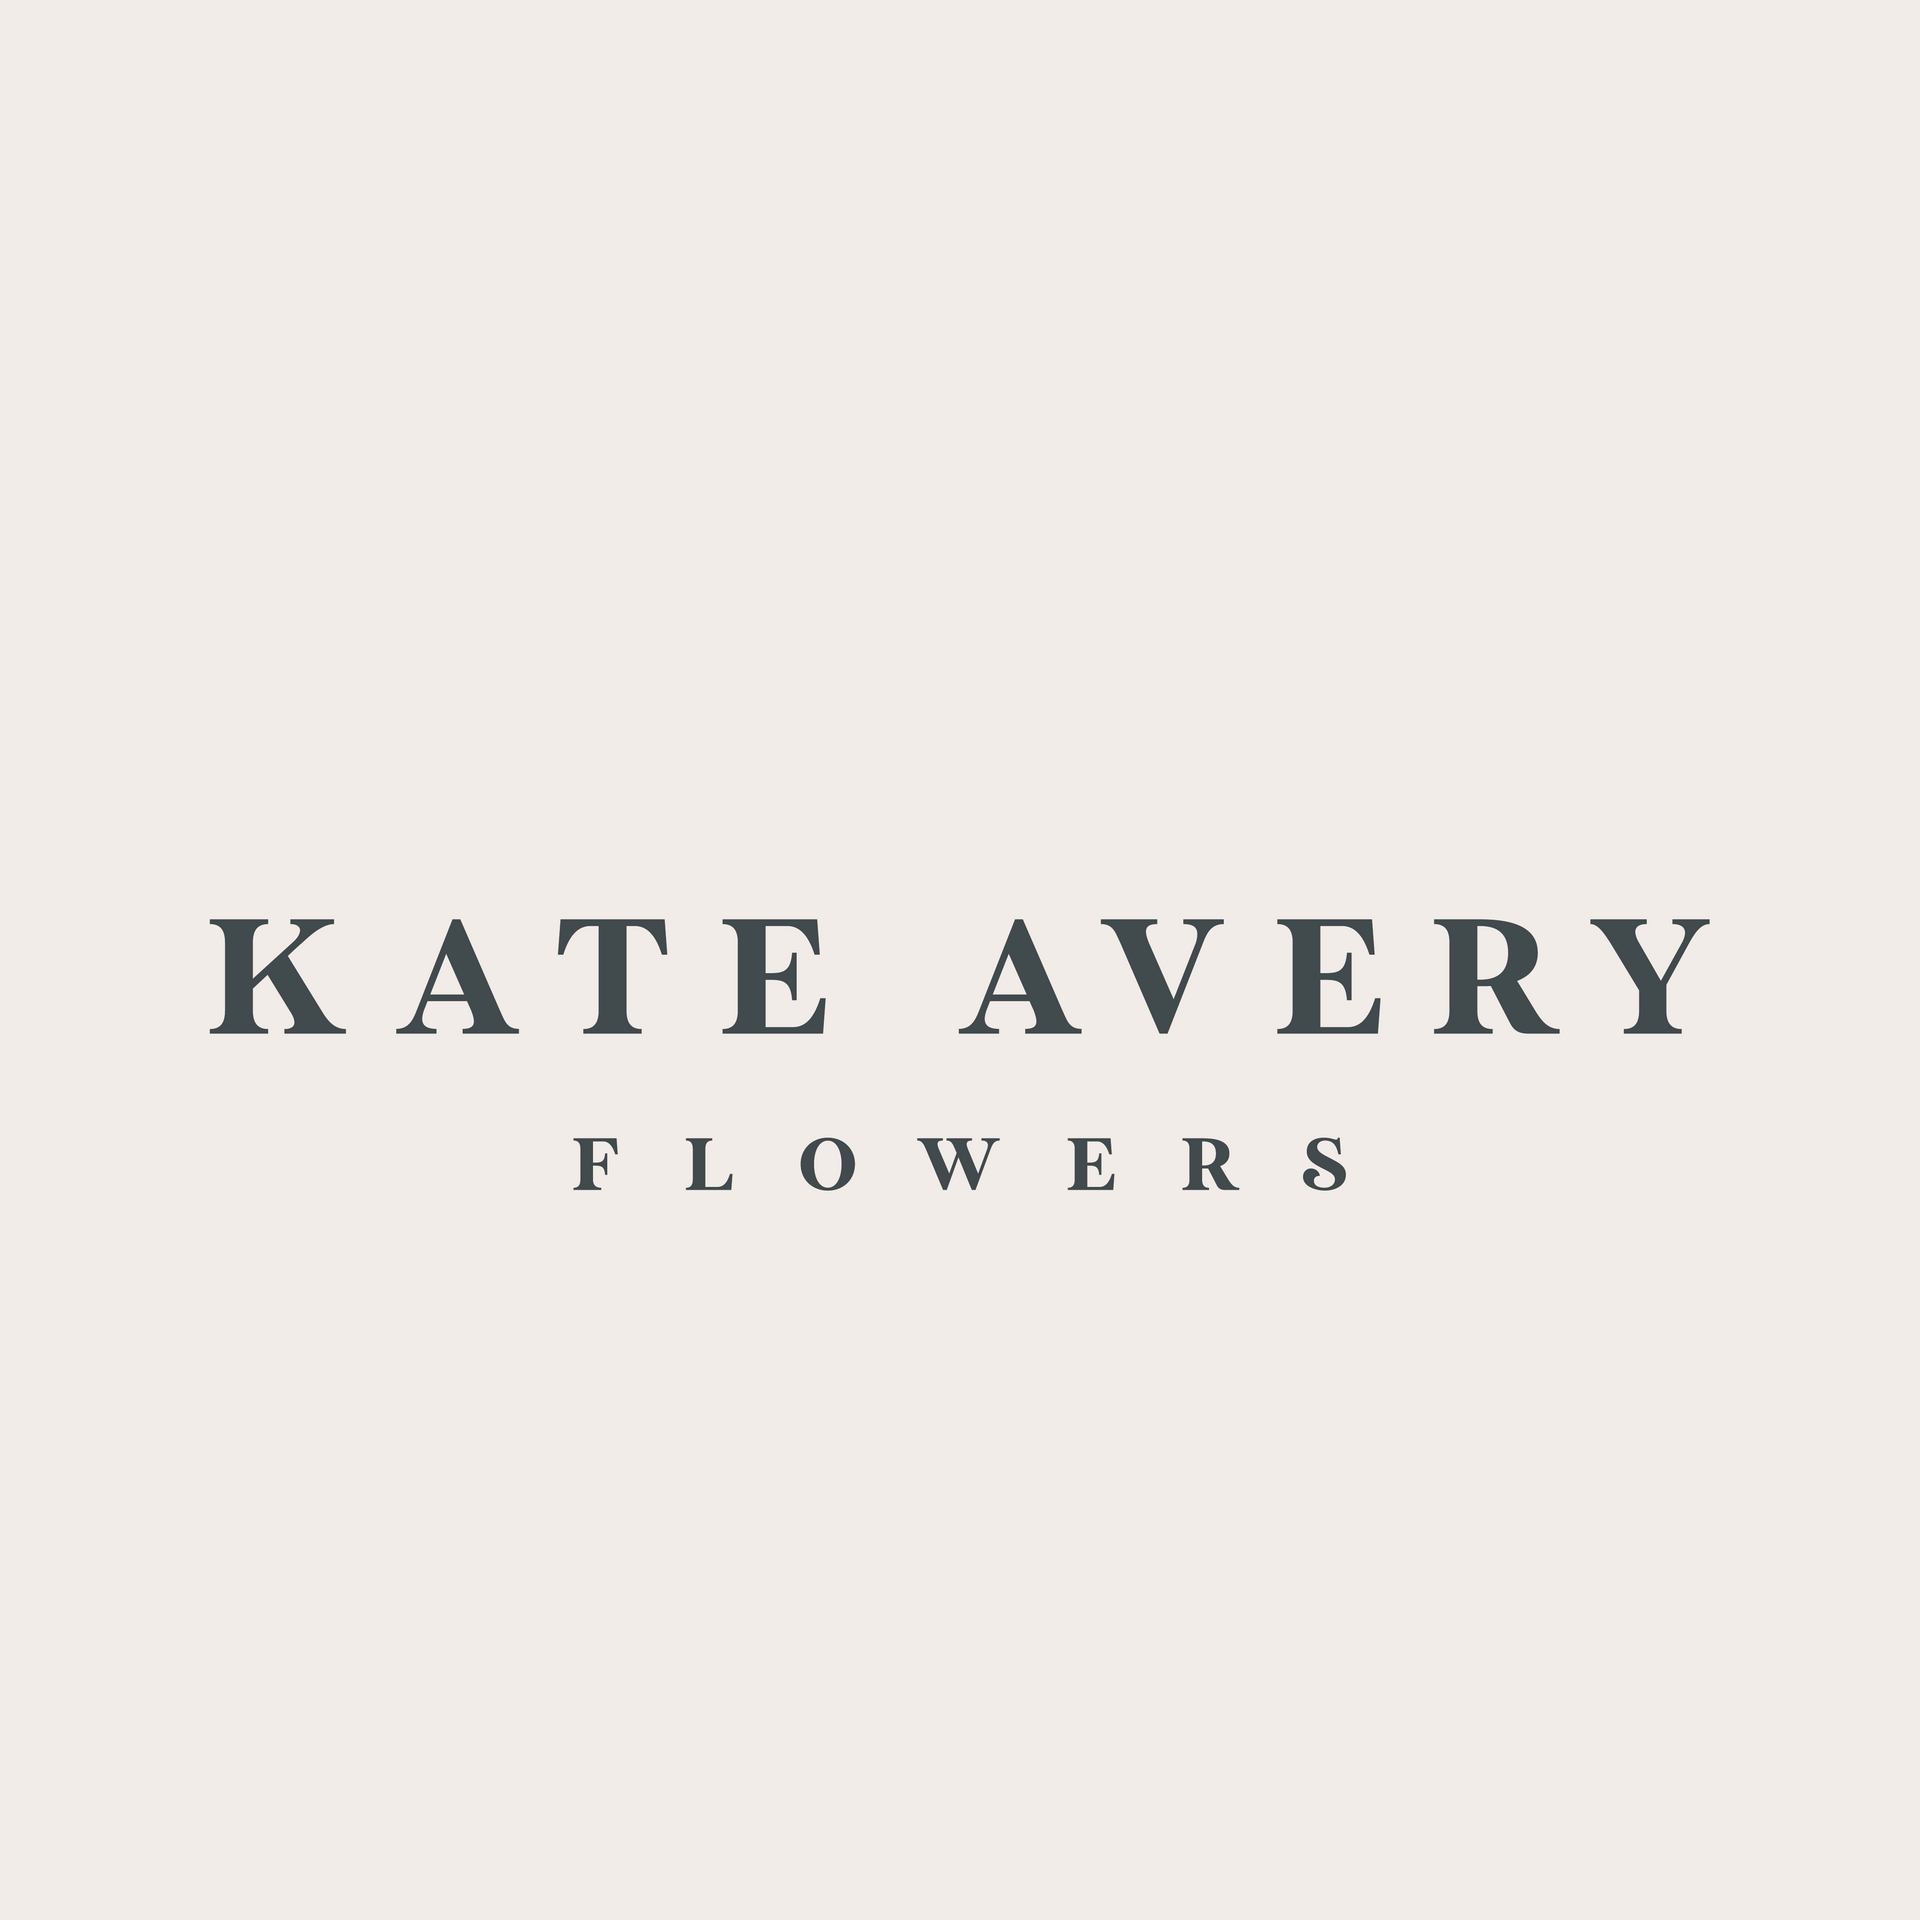 Florist Branding | Brand Identity Design by Fresh Leaf Creative